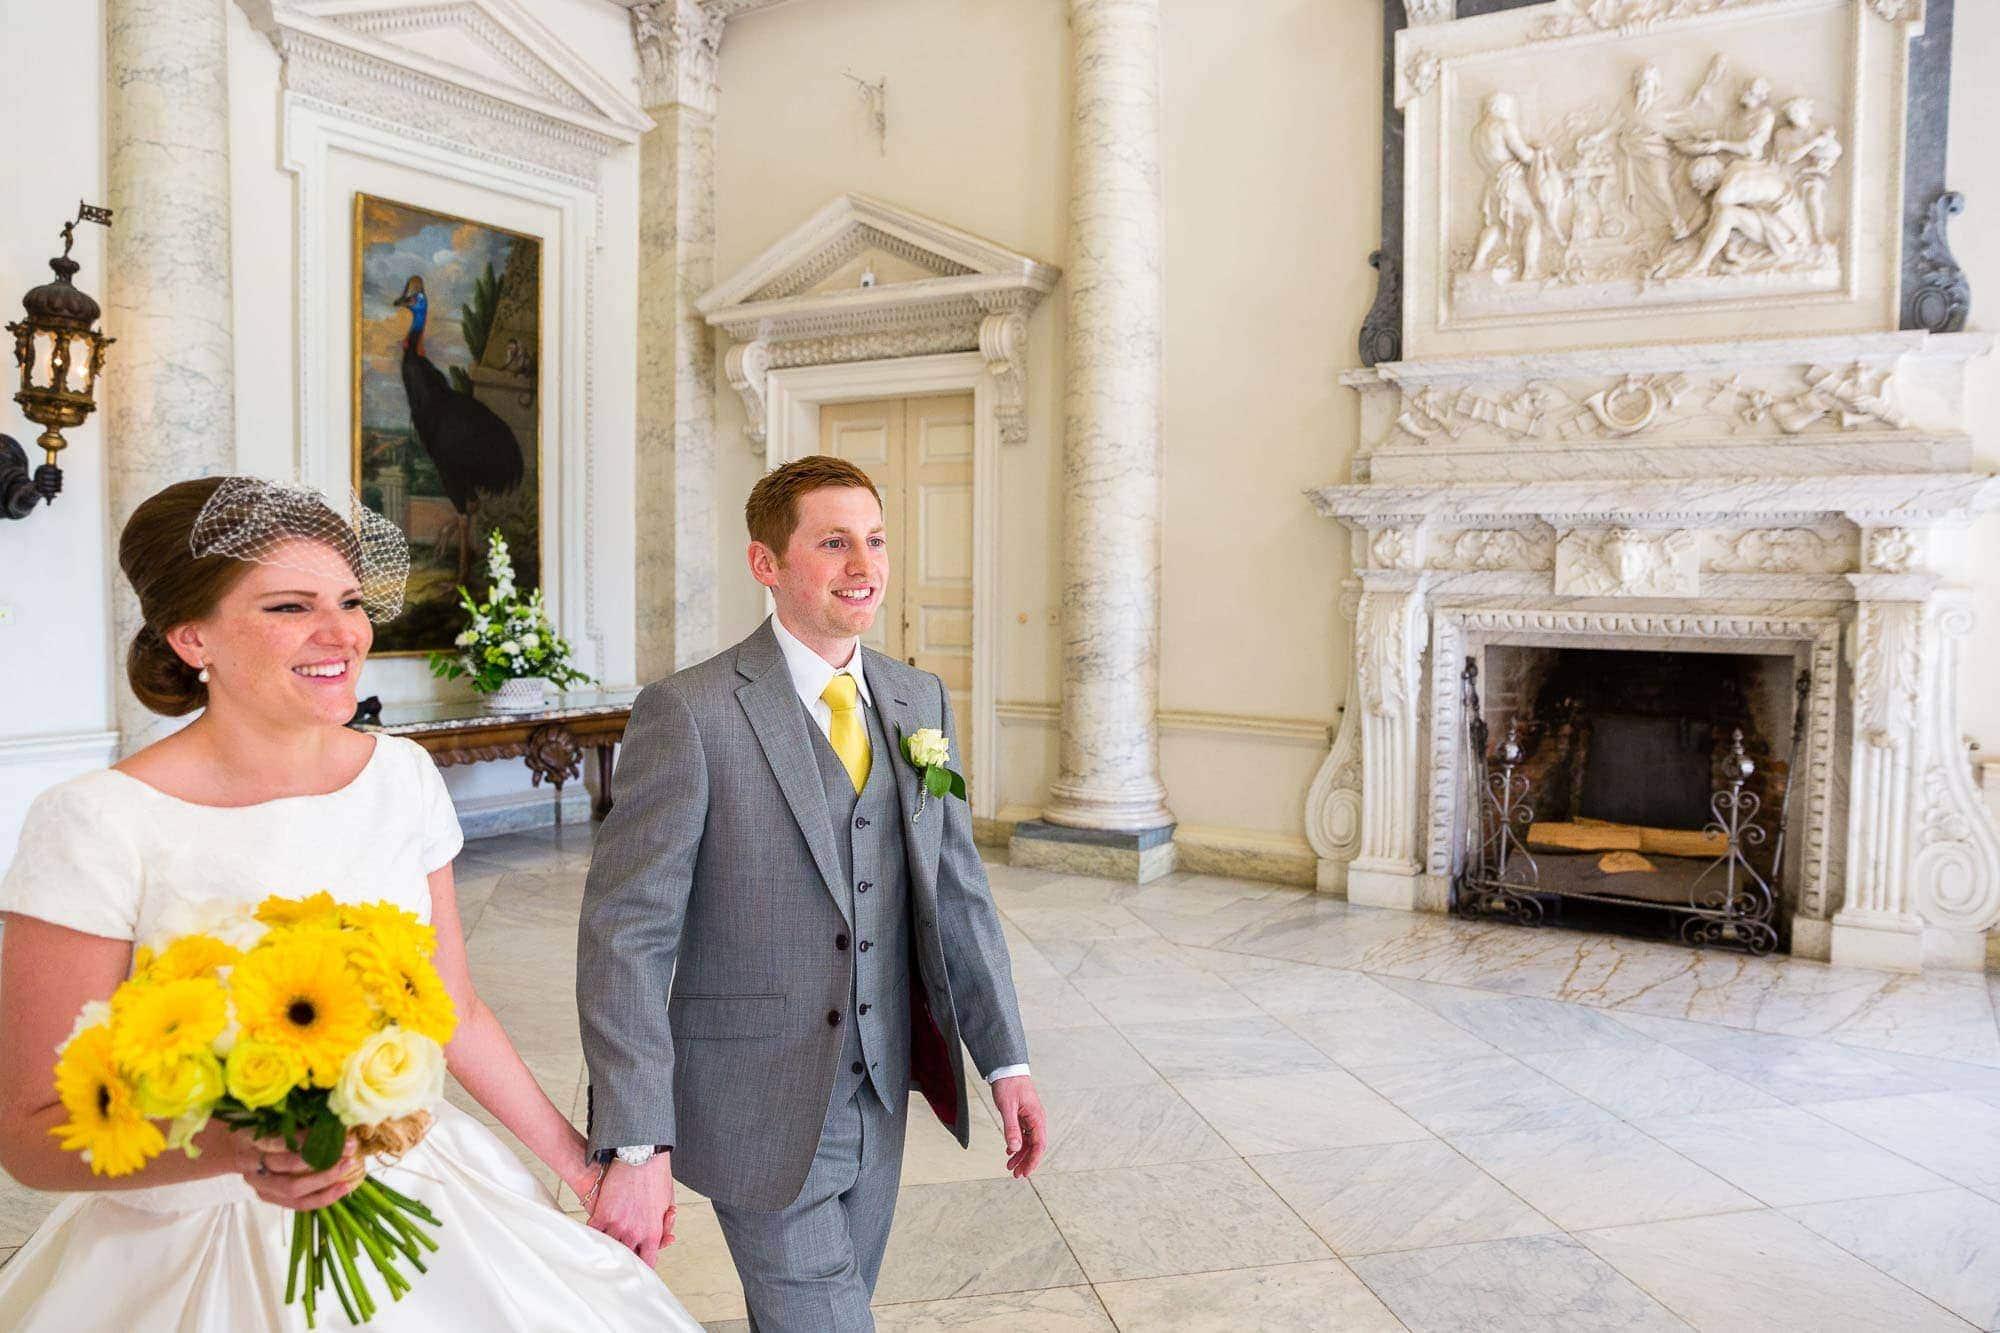 Clandon Park Wedding Photographer 55 5694